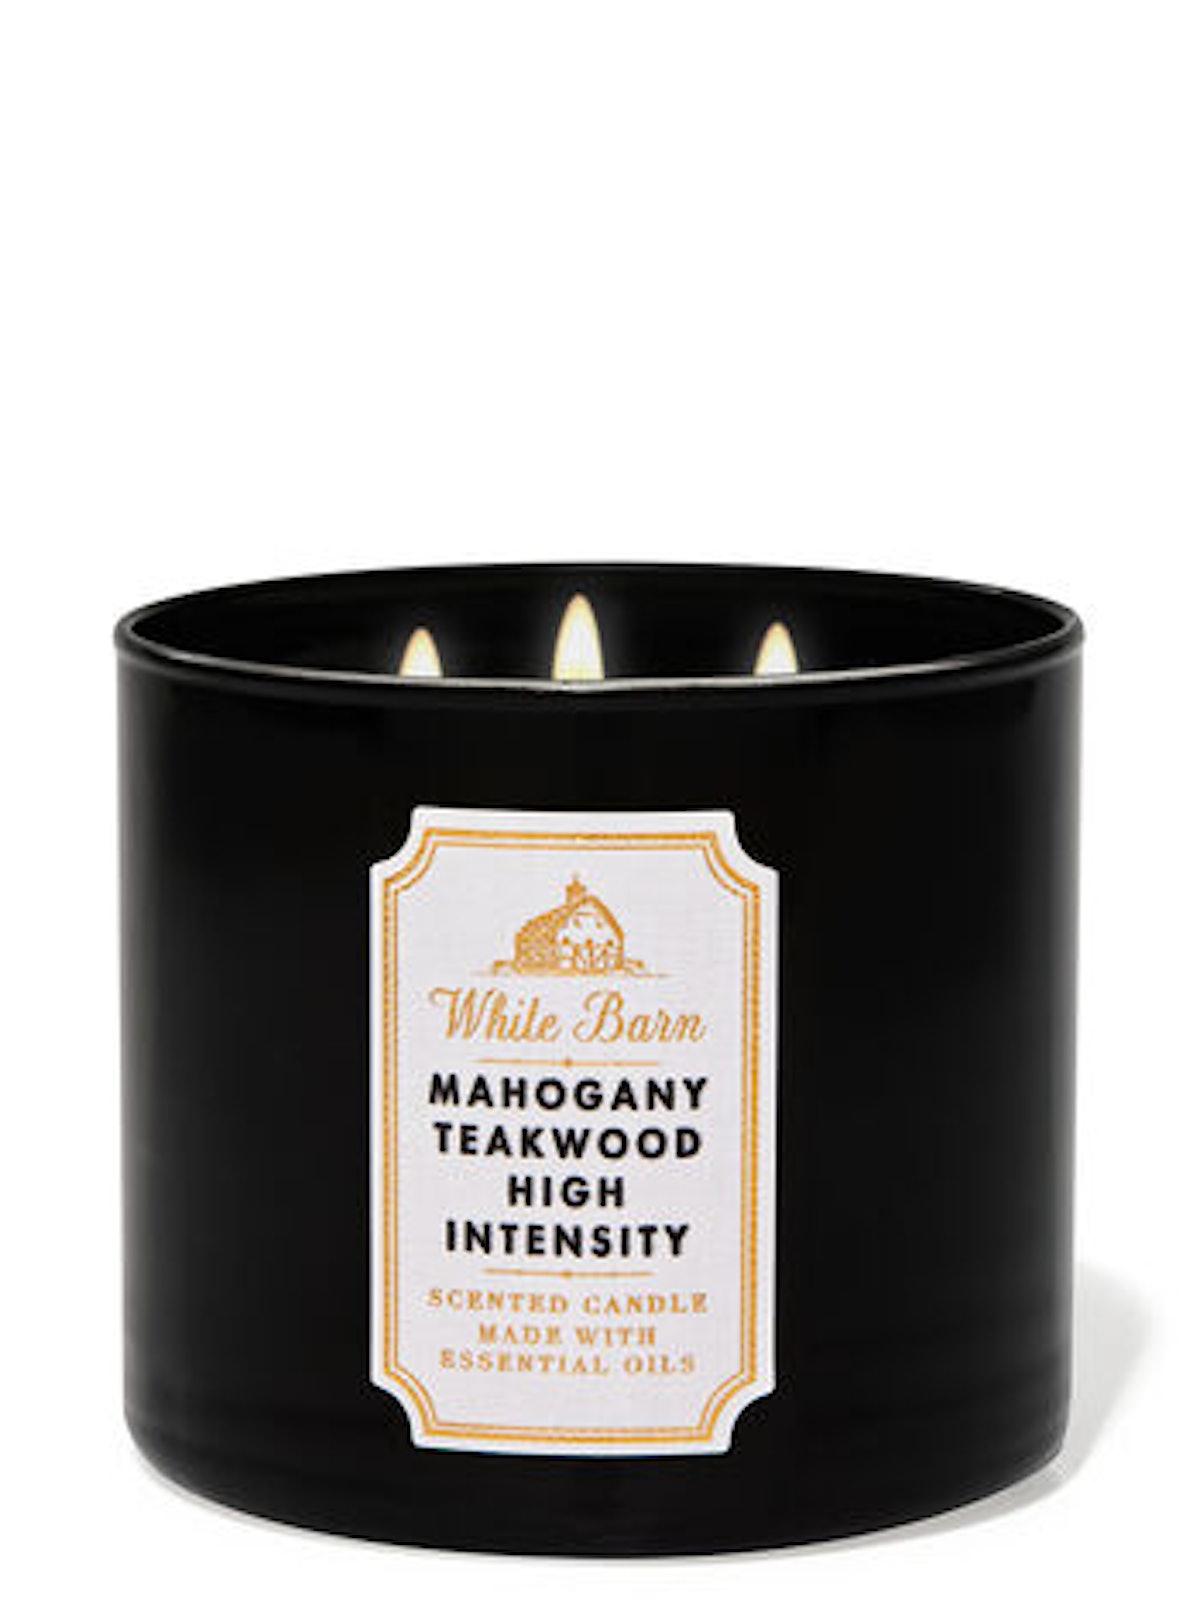 Mahogany Teakwood High Intensity Three-Wick Candle